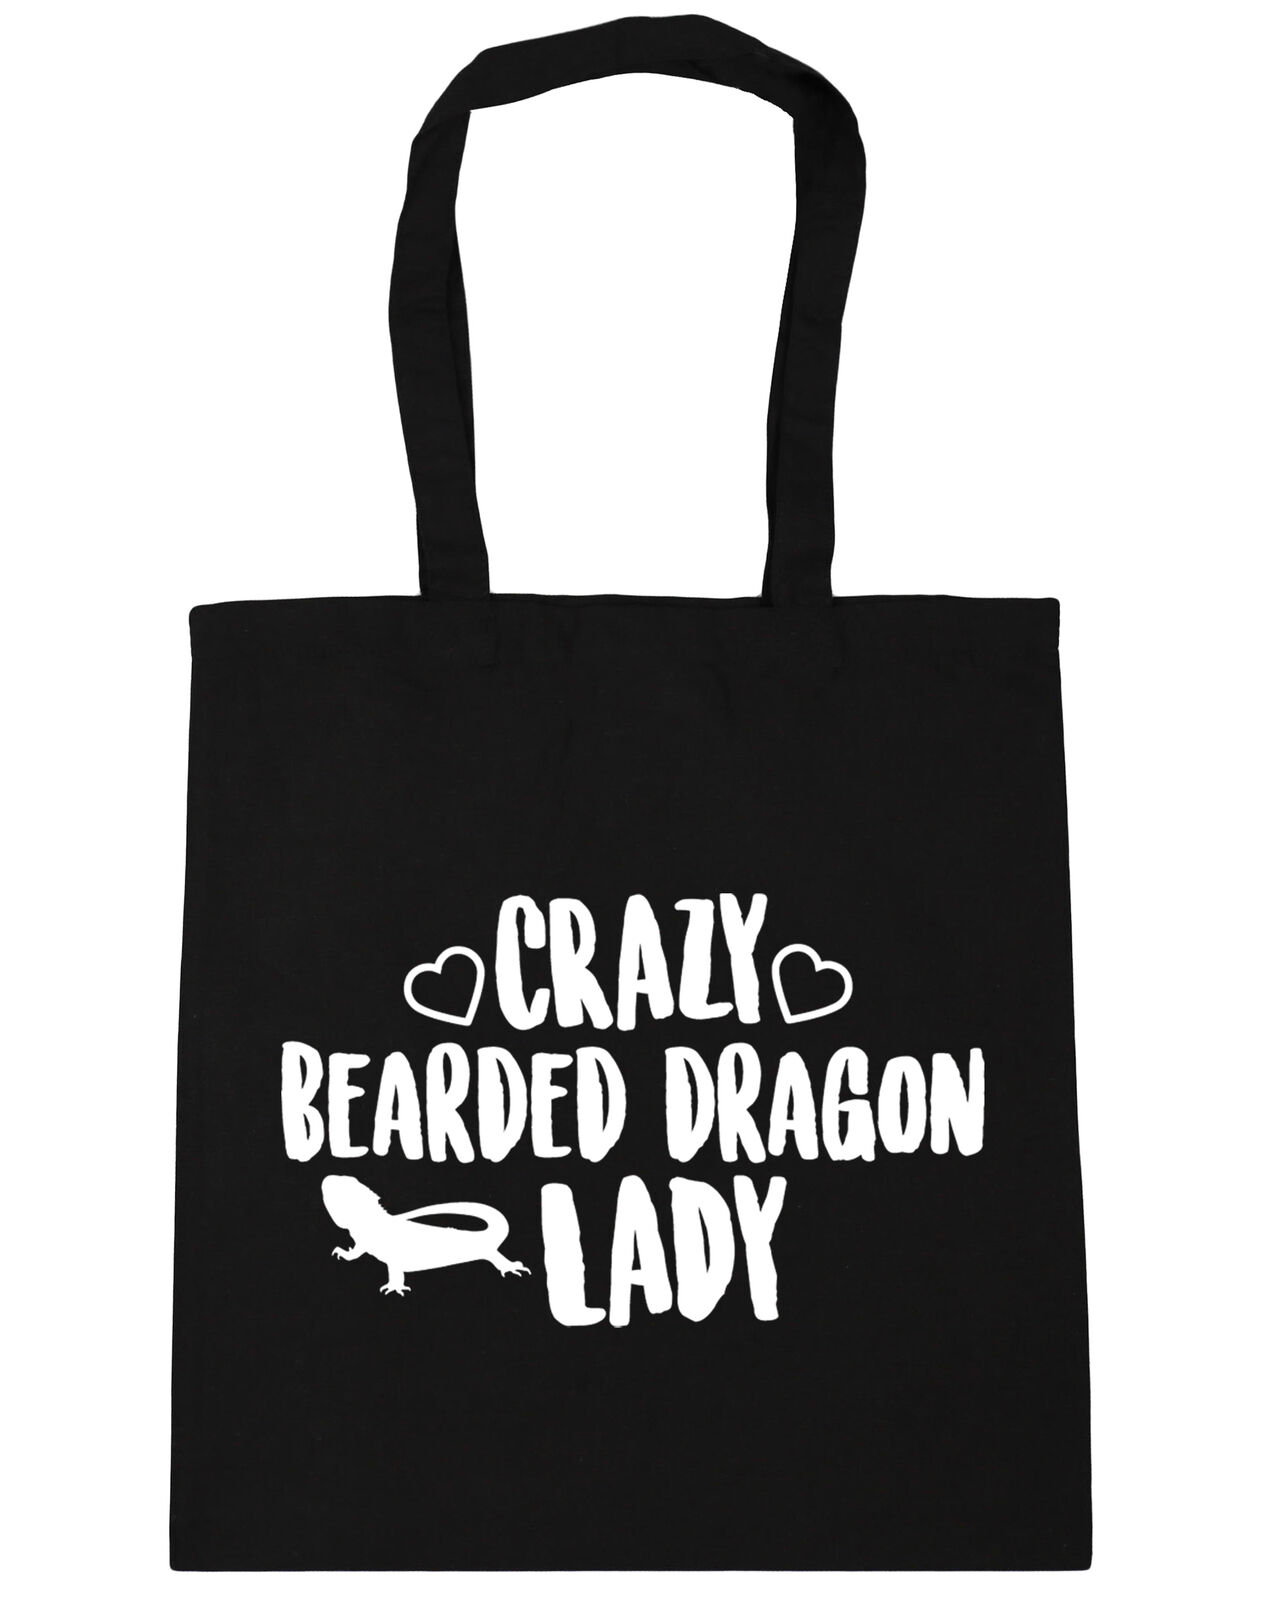 10 litres Crazy bearded dragon lady Tote Shopping Gym Beach Bag 42cm x38cm